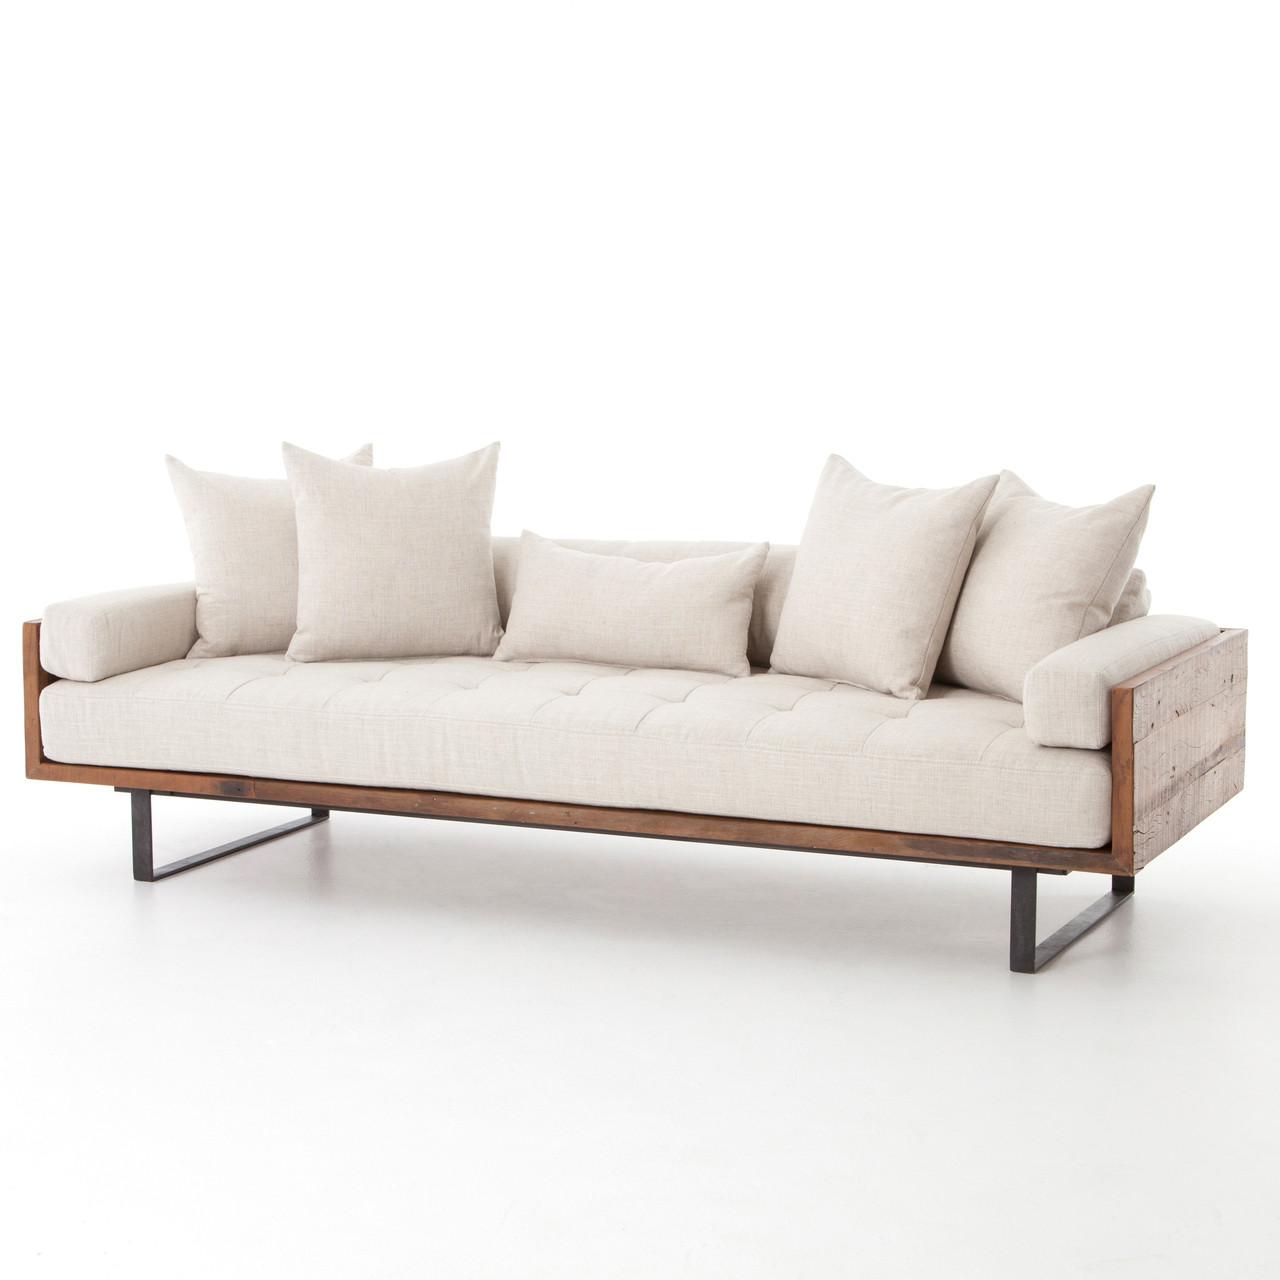 sofa wood frame exposed uk sofas coventry ranger rustic loft natural linen zin home